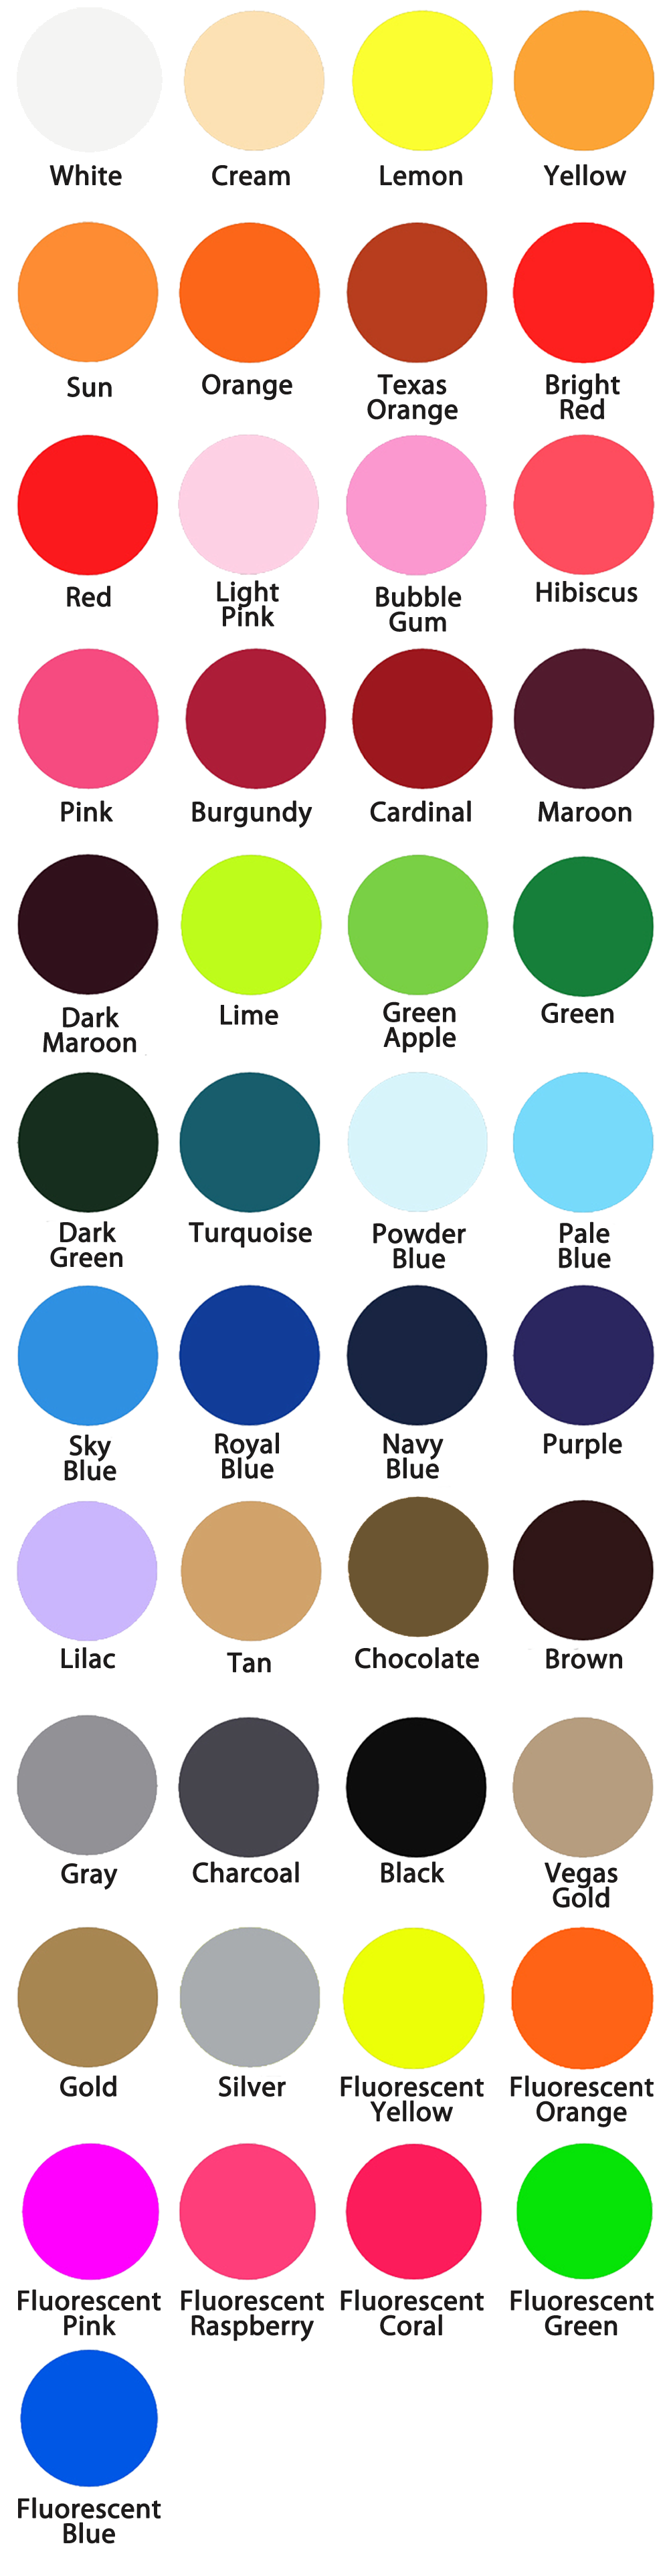 Siser color chart fashion. Heat clipart heat transfer